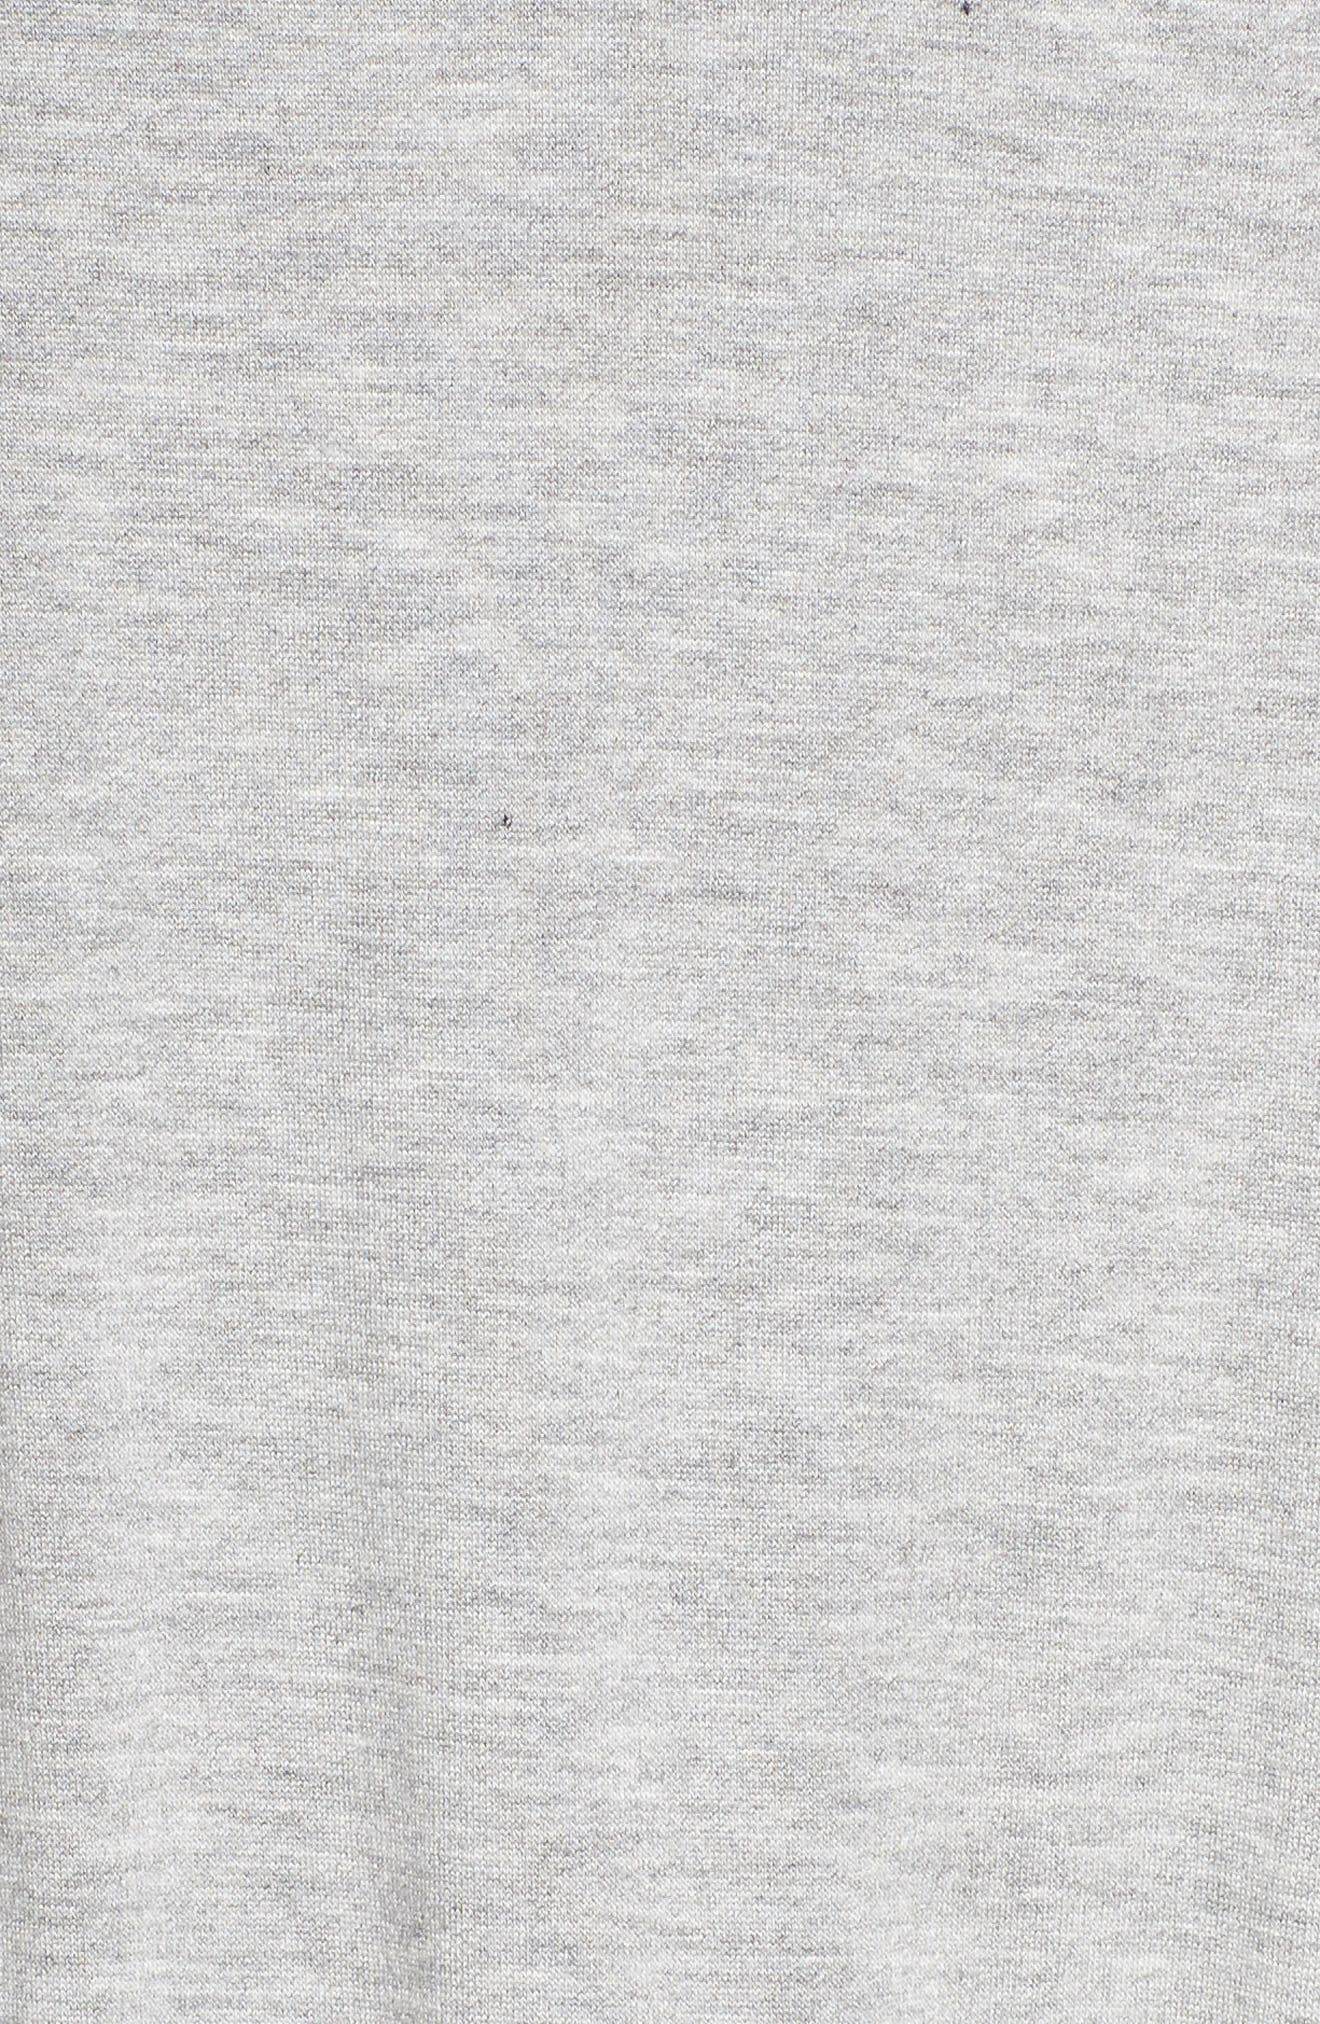 Farrah Cropped Jumpsuit,                             Alternate thumbnail 6, color,                             Light Heather Gray